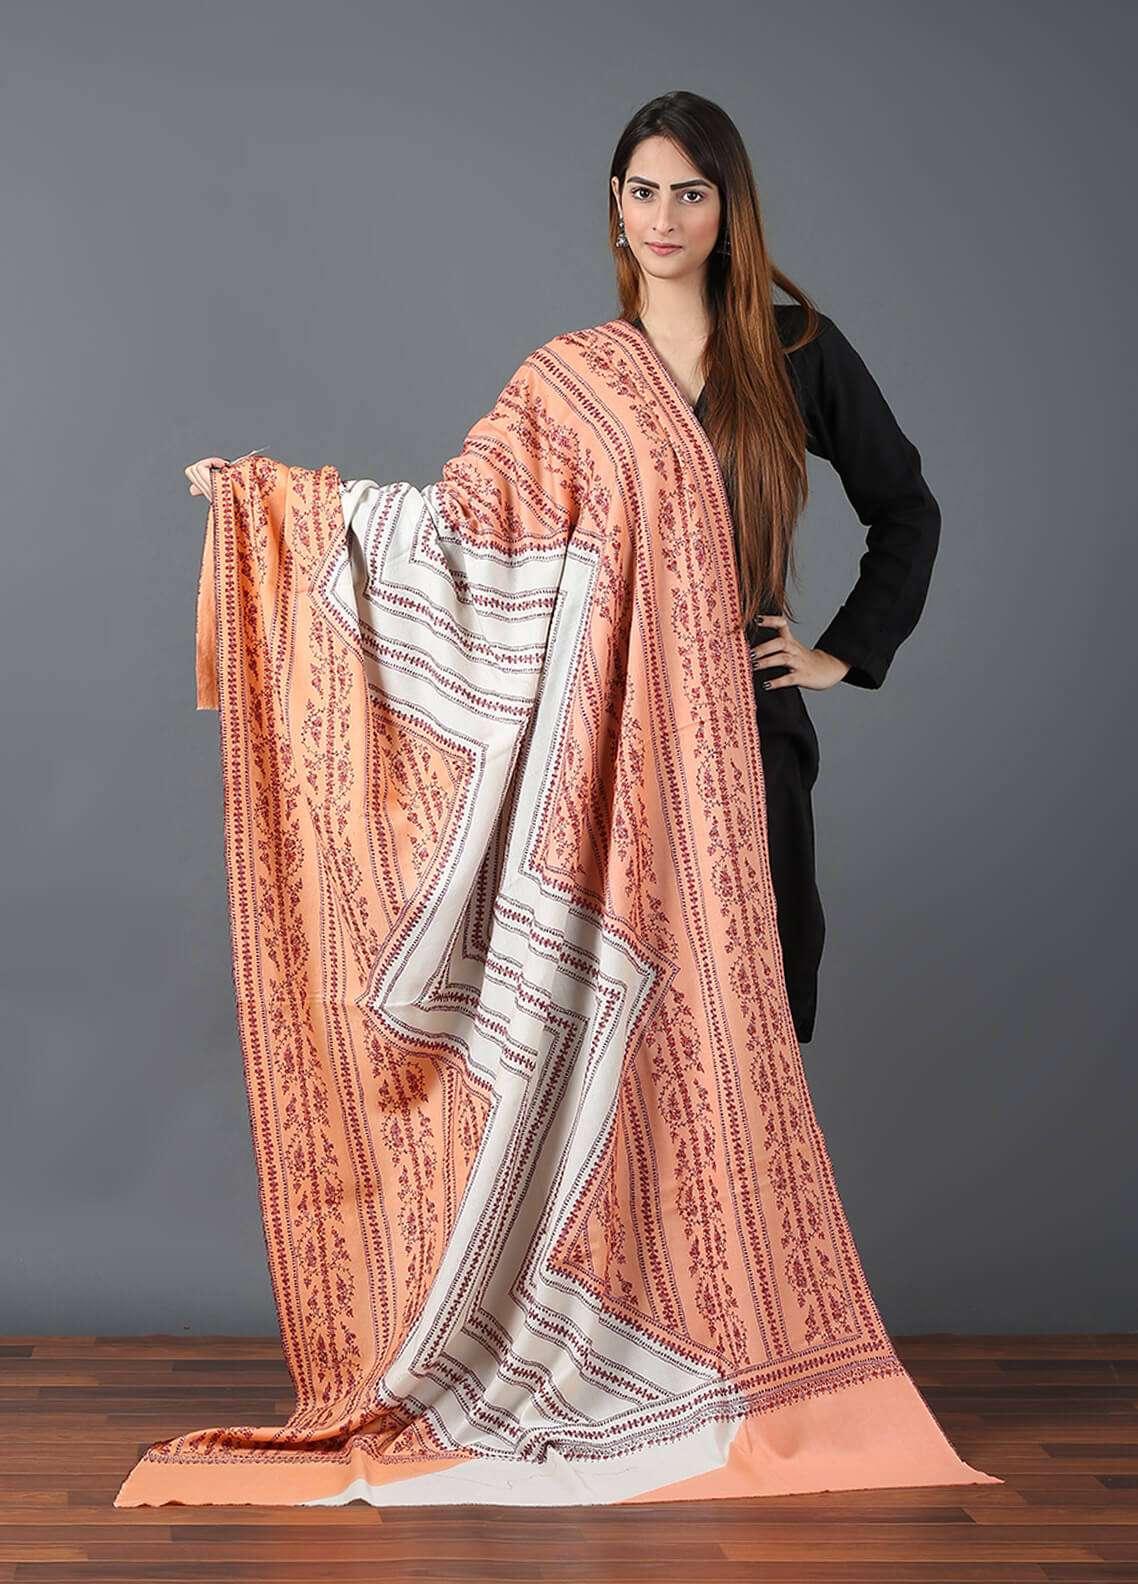 Sanaulla Exclusive Range Pashmina Embroidered Shawl 644 - Kashmiri Shawls